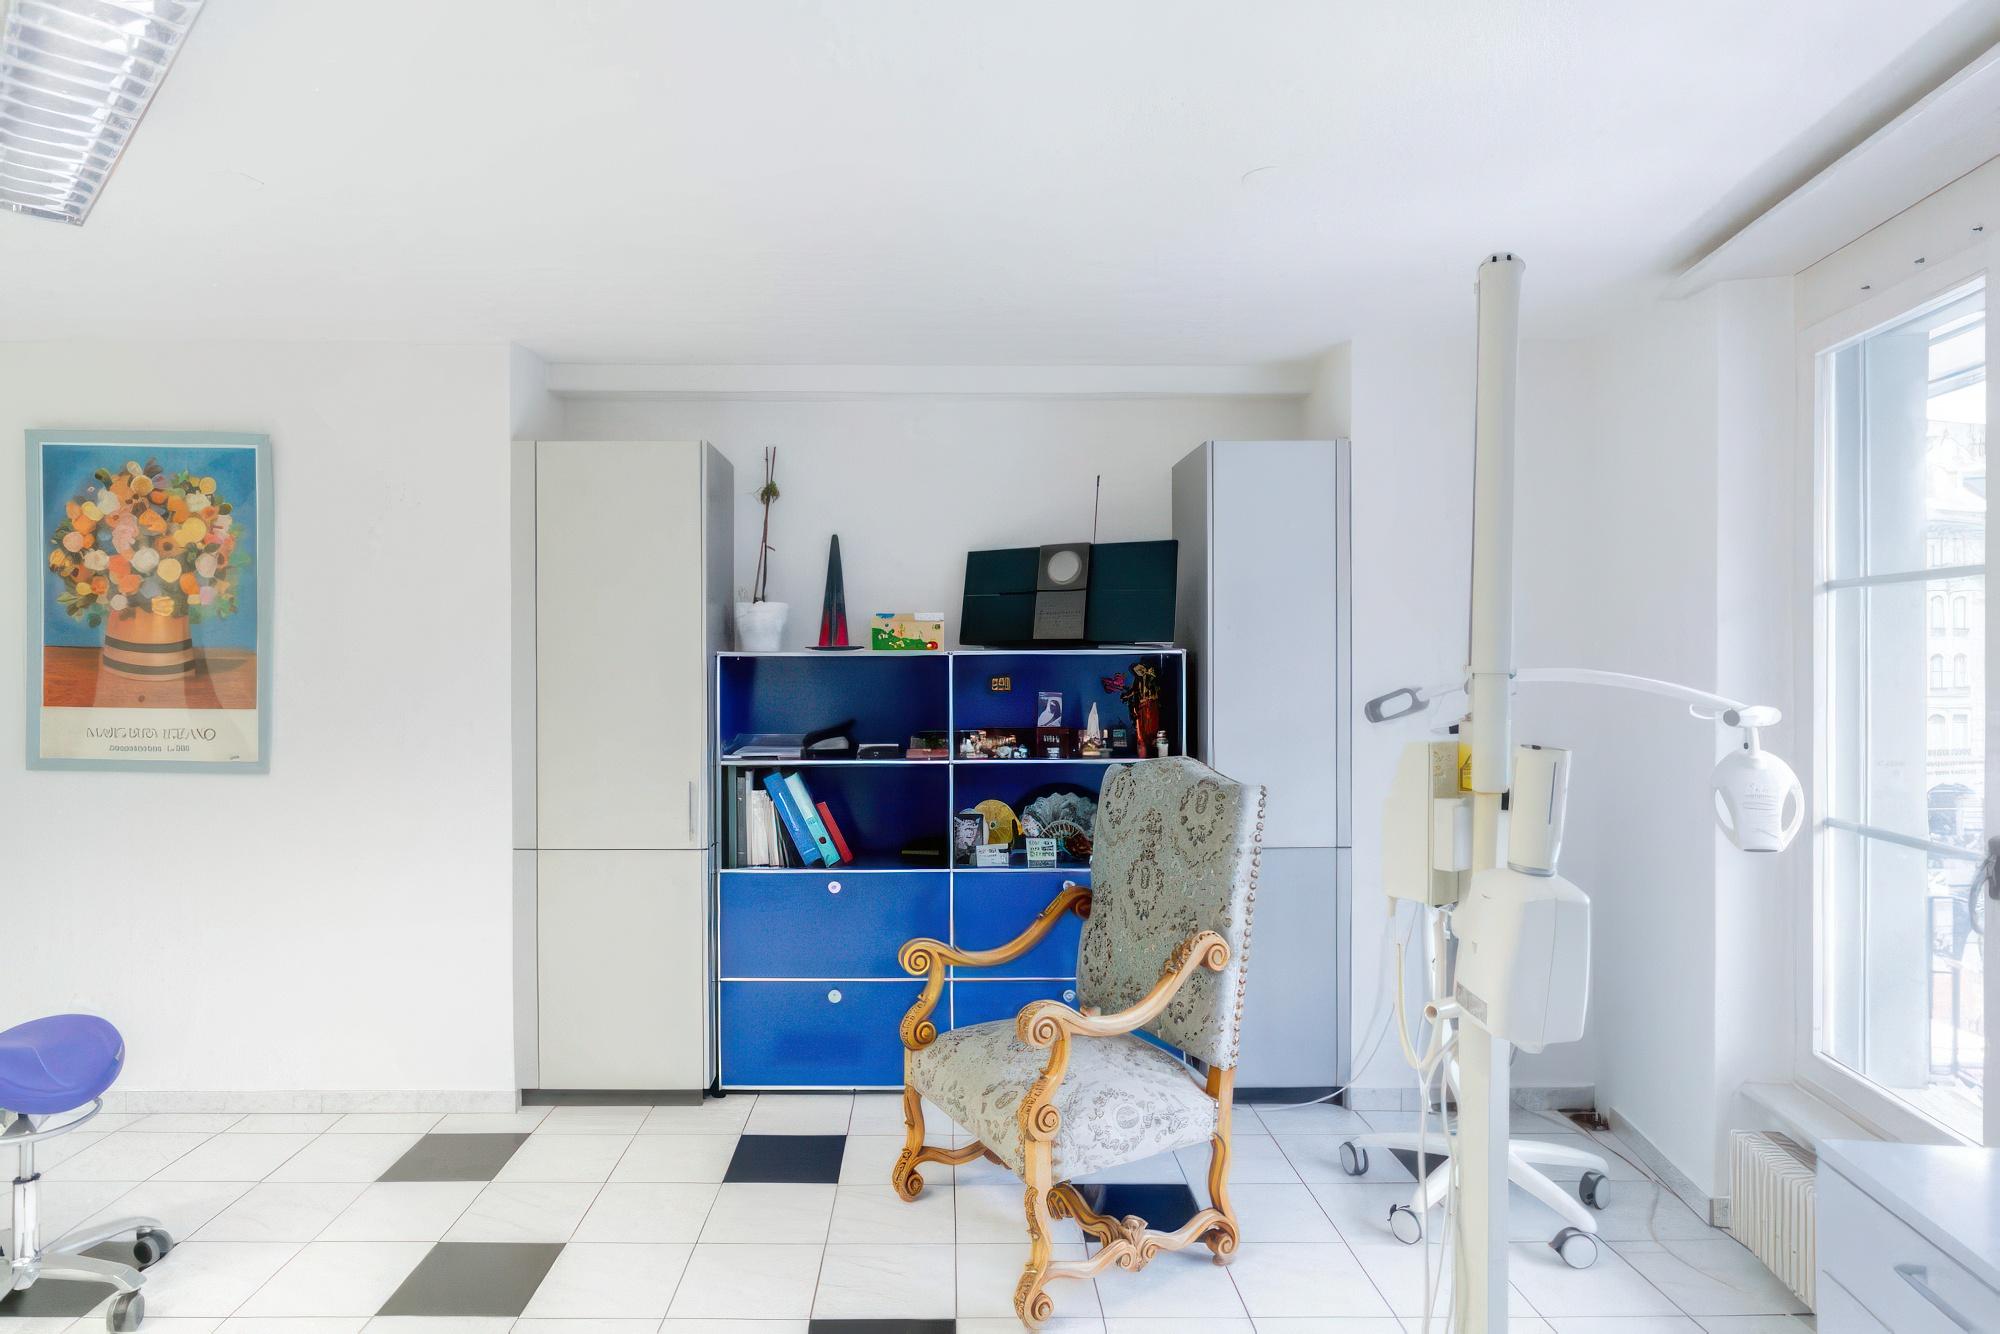 Zahnarztpraxis Nelsy Blaser-Mayorga in Bern